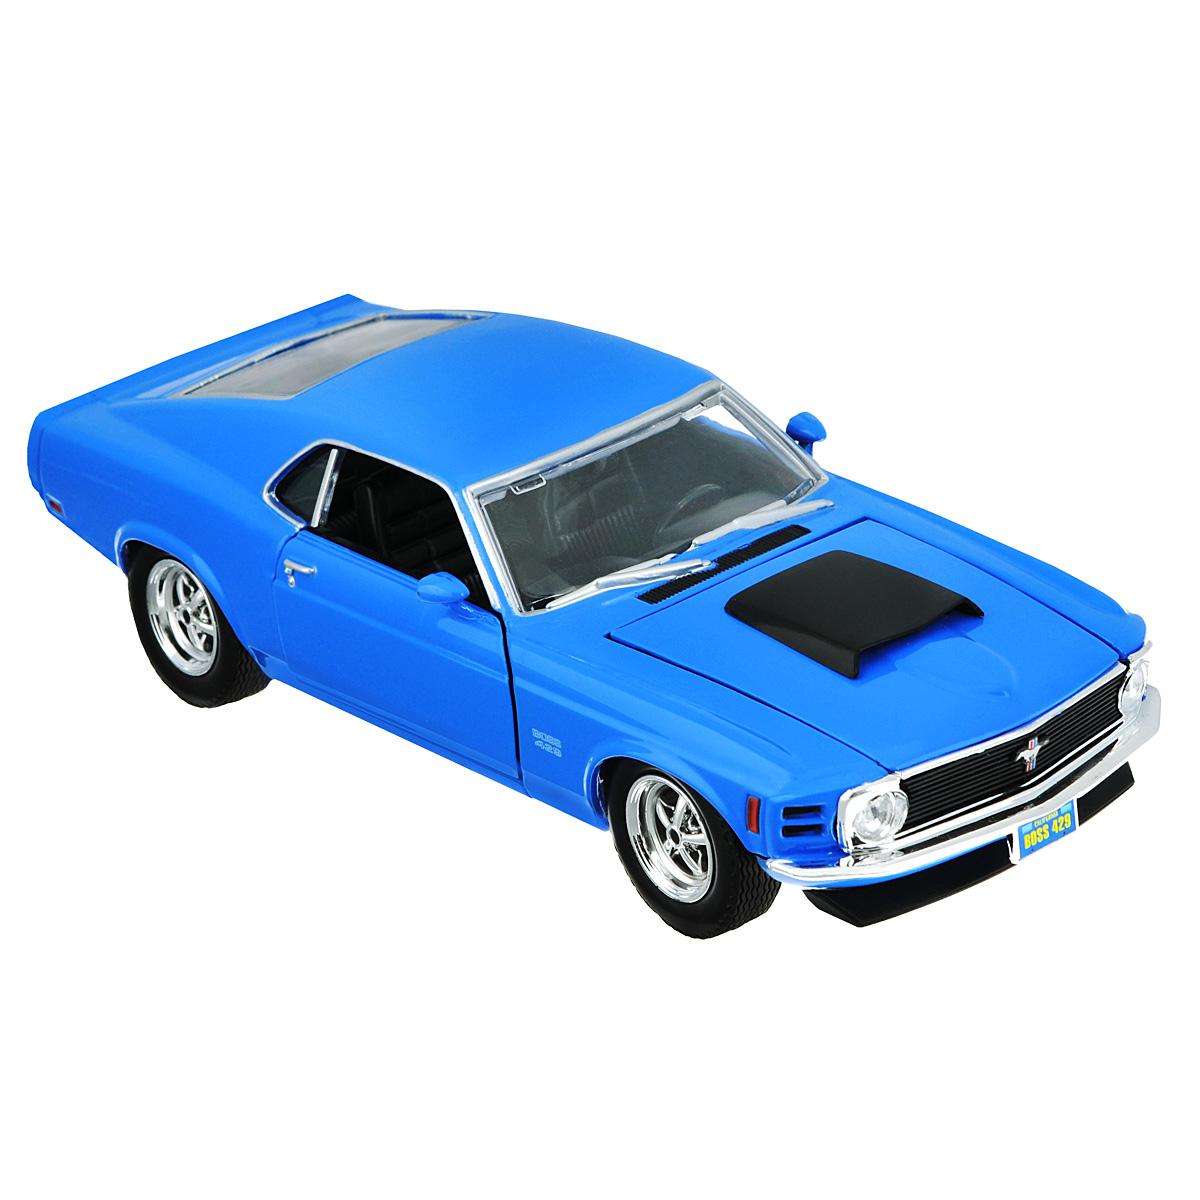 MotorMax Модель автомобиля Ford Mustang Boss 429 1970 motormax трансформирующийся в аэропорт